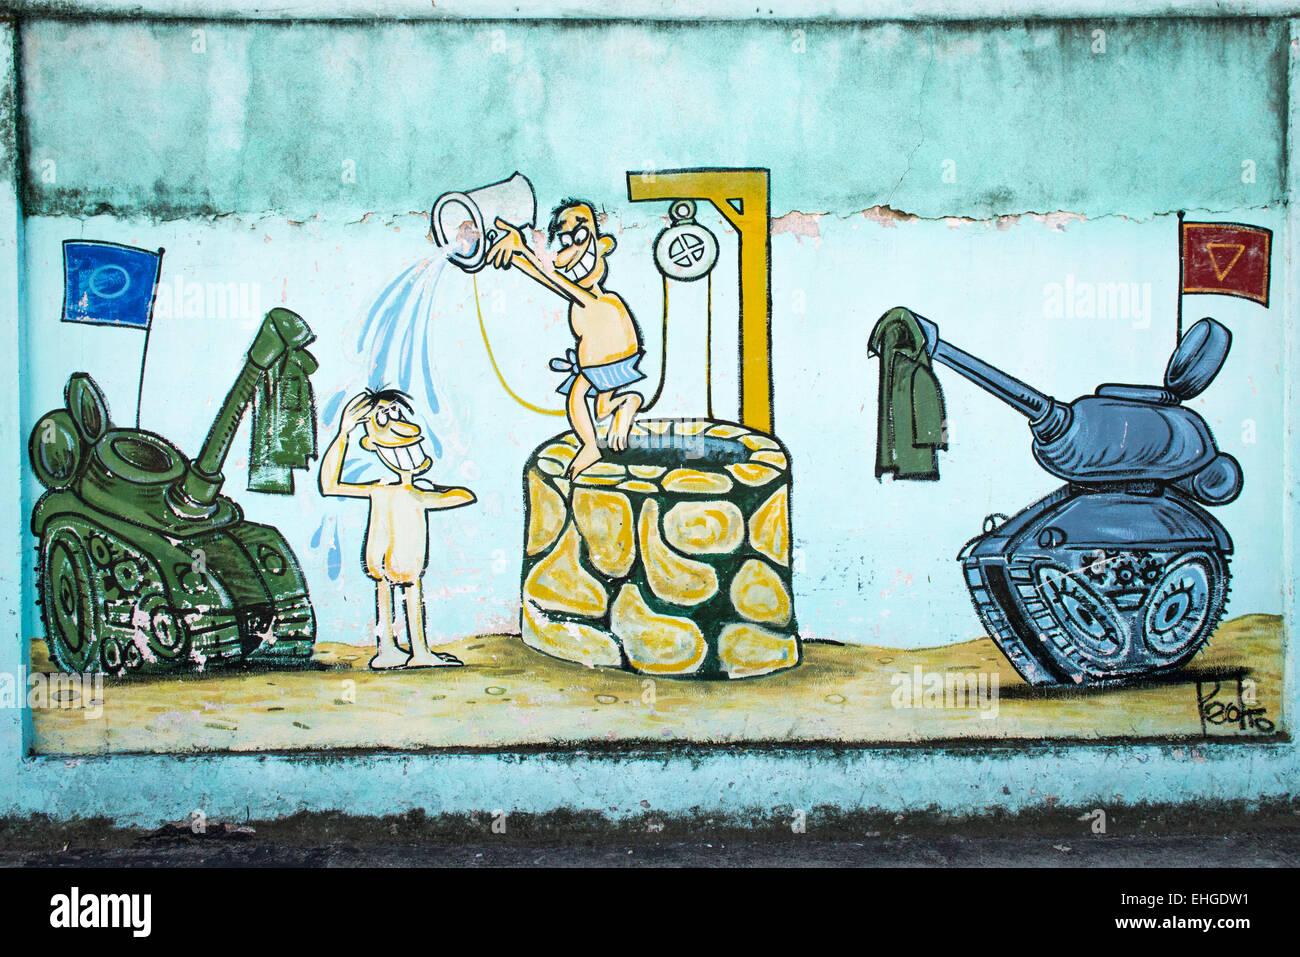 Kuba Santa Clara Reihe von politischen extremen anti-USA North American Cartoon cartoons Wandbilder Wände Soldaten Stockbild